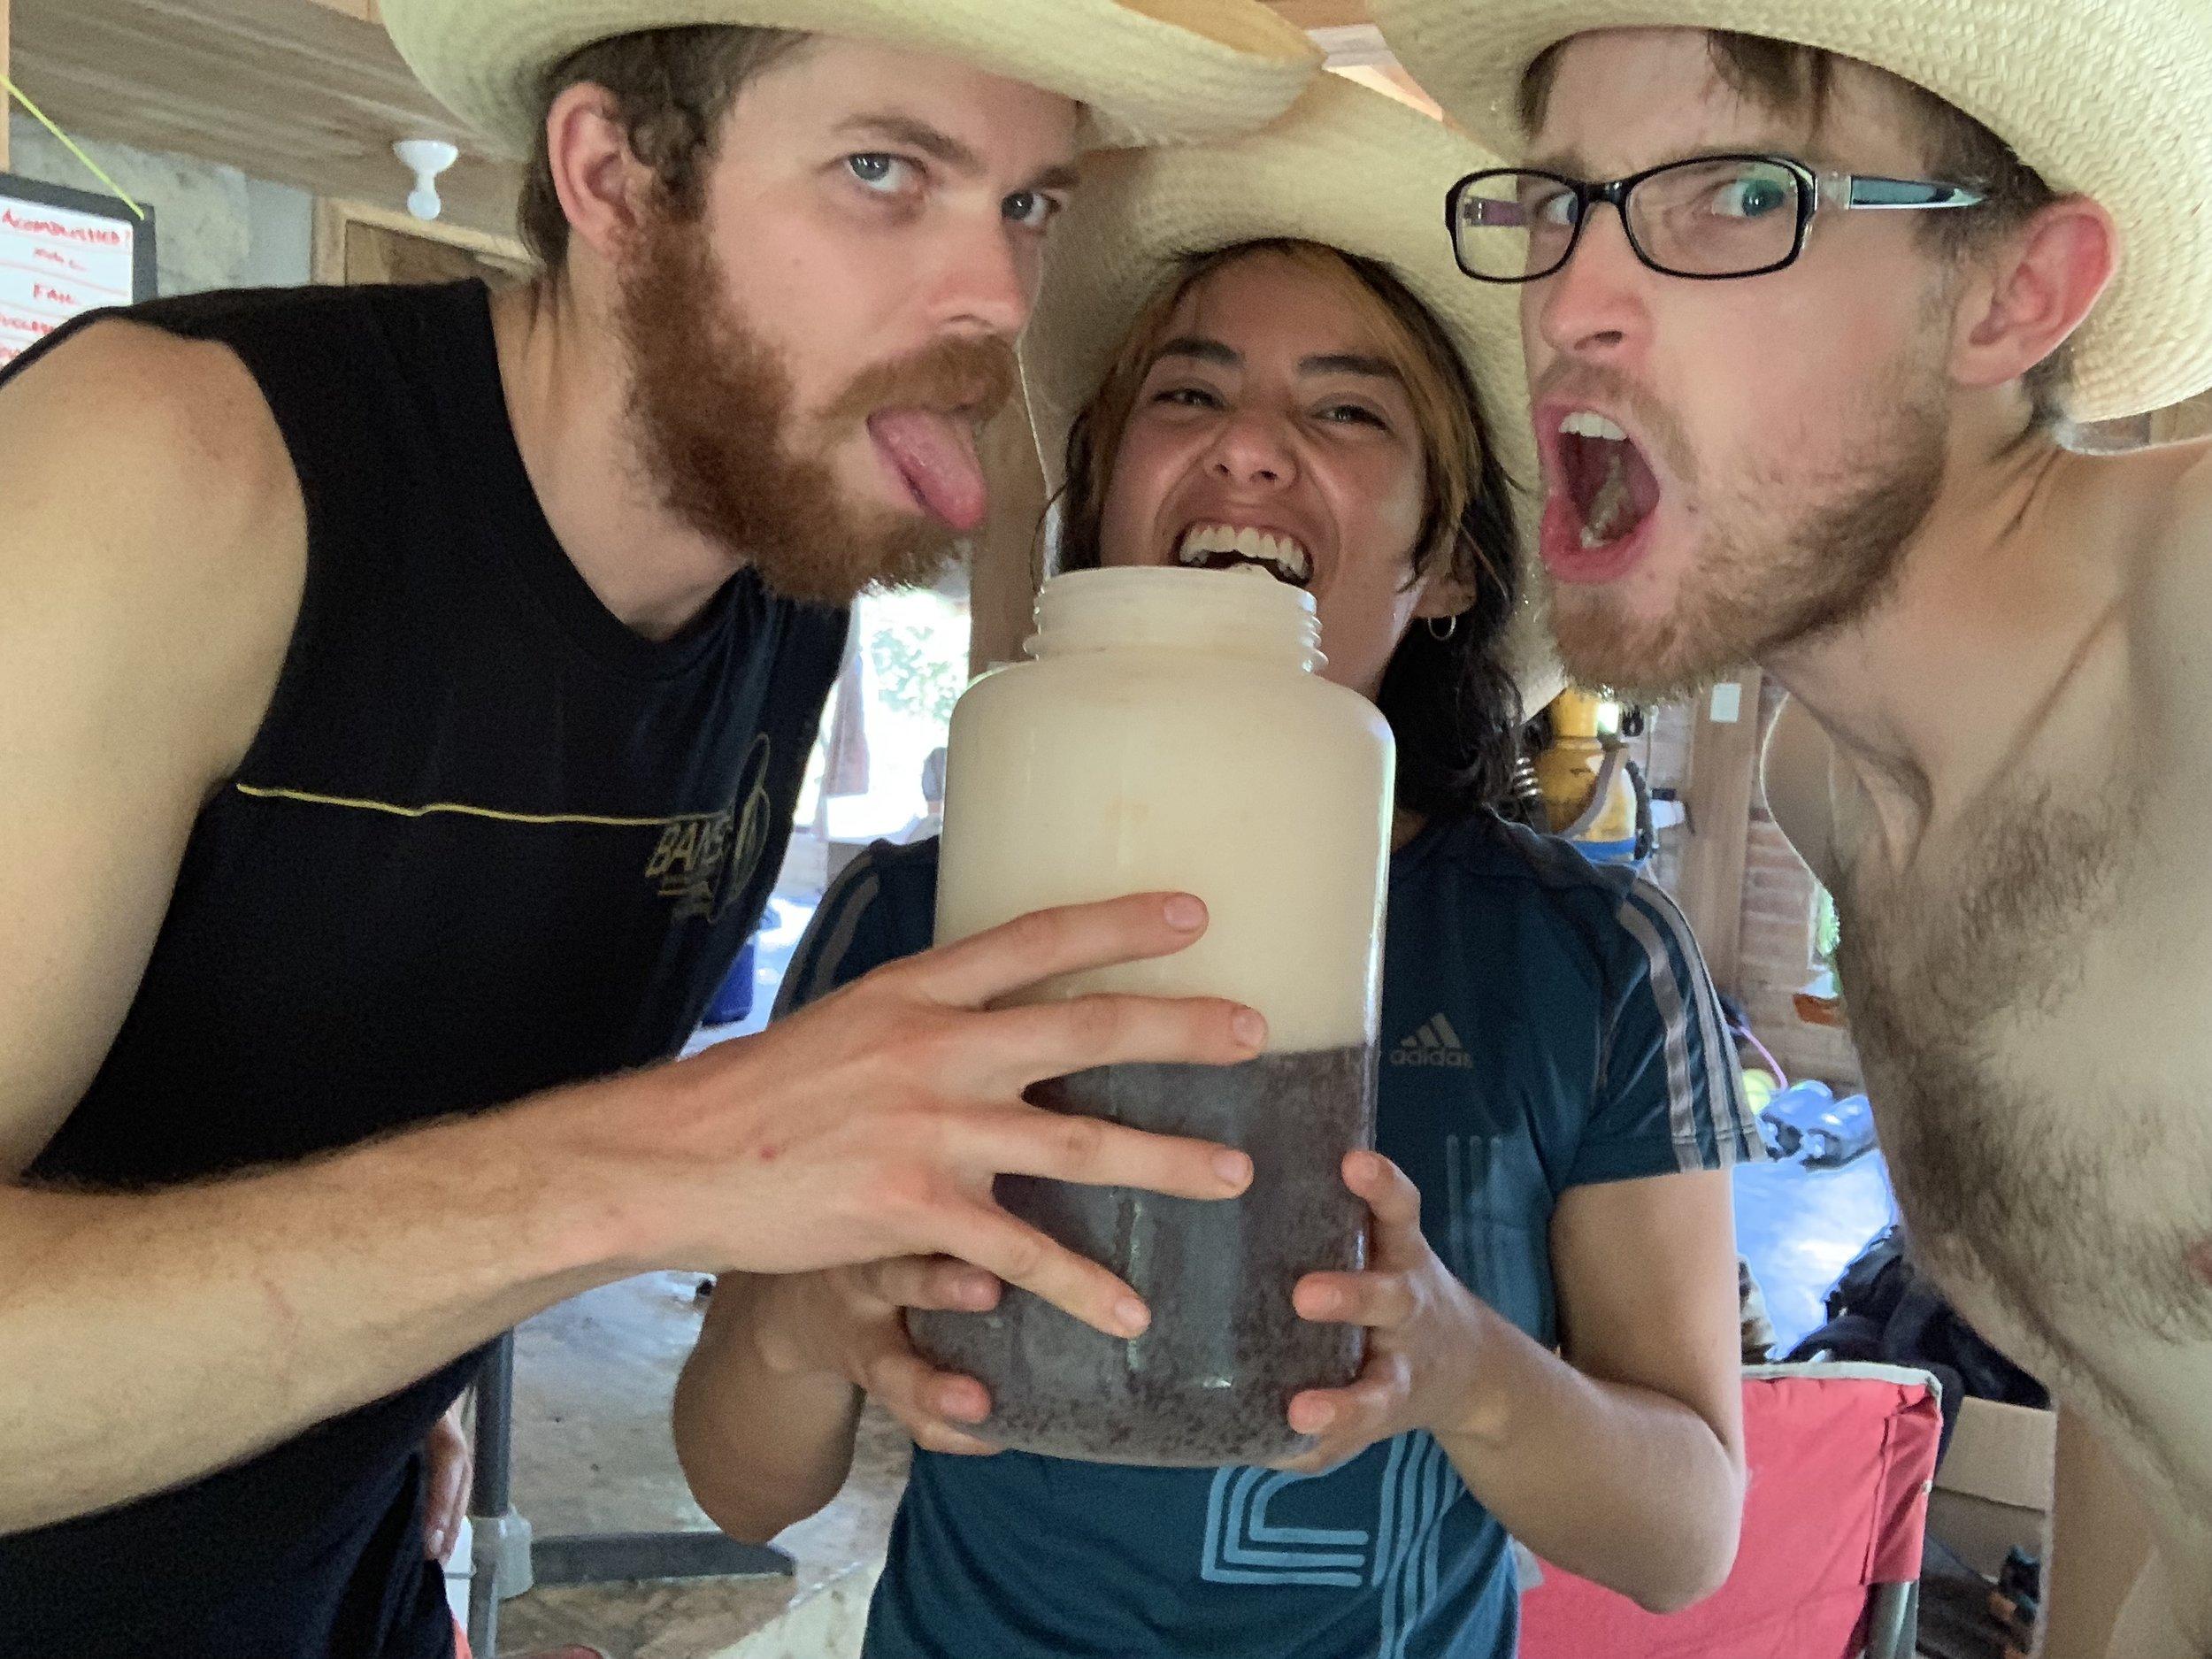 Steve Lamebrt, Alejandra Mendoza, and Teddy Garlock drinking beer out of 4l Nalgene containers. Photo by Teddy Garlock.